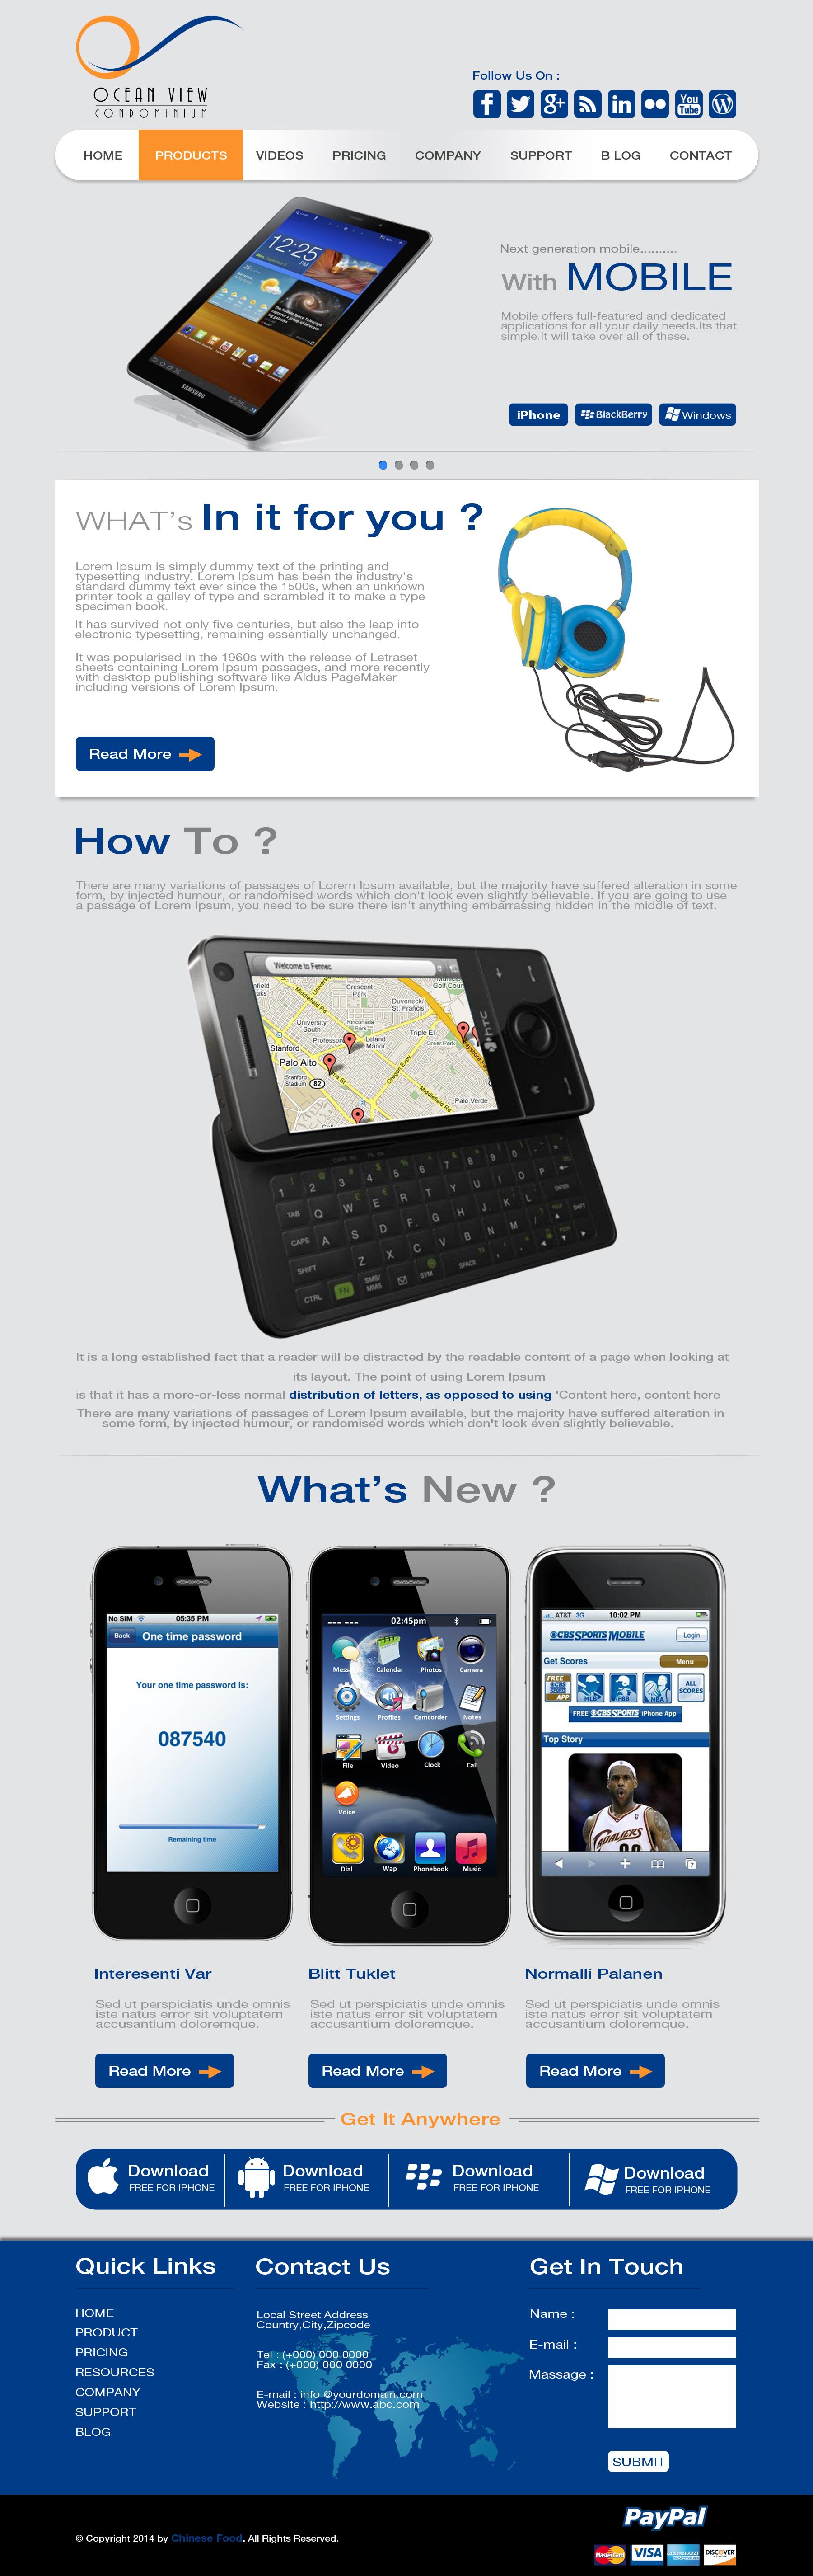 Demowebsite_business whats new business blog